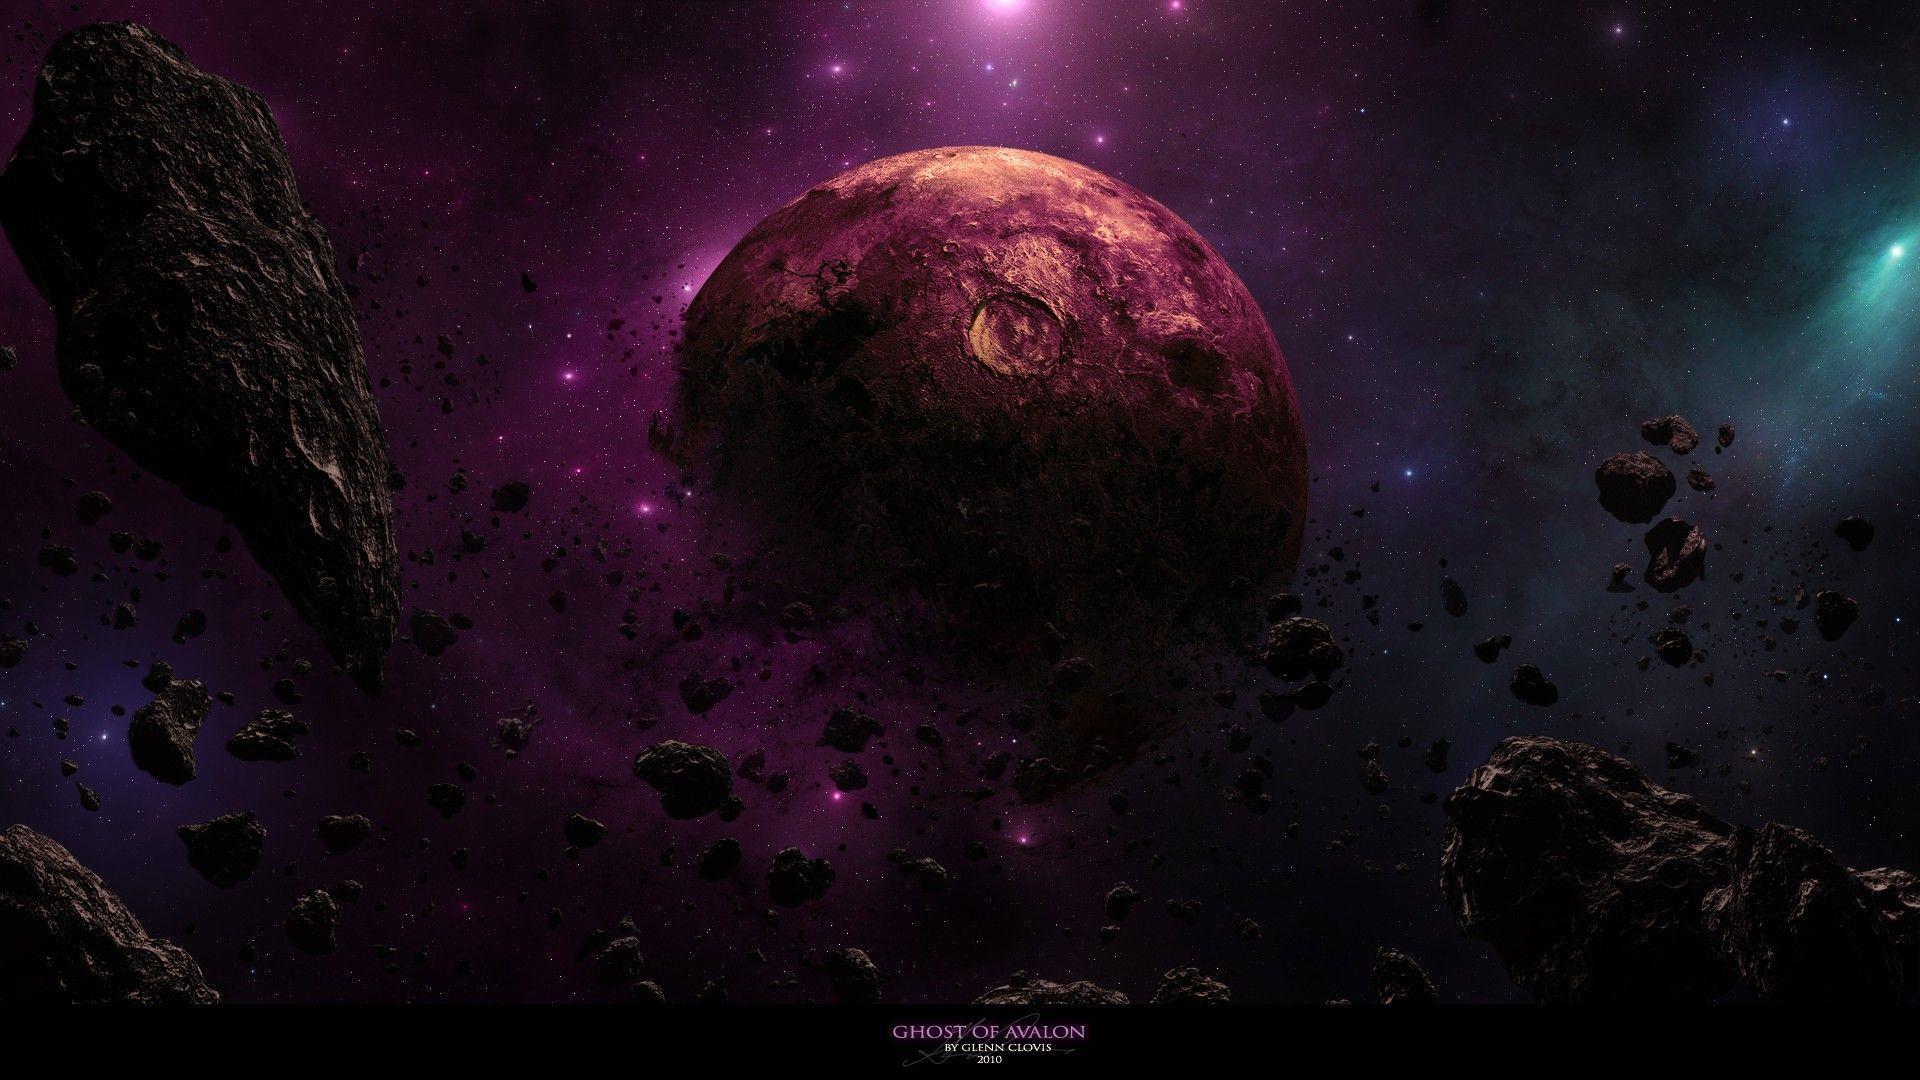 Sci Fi Horror Hd Wallpapers Top Free Sci Fi Horror Hd Backgrounds Wallpaperaccess